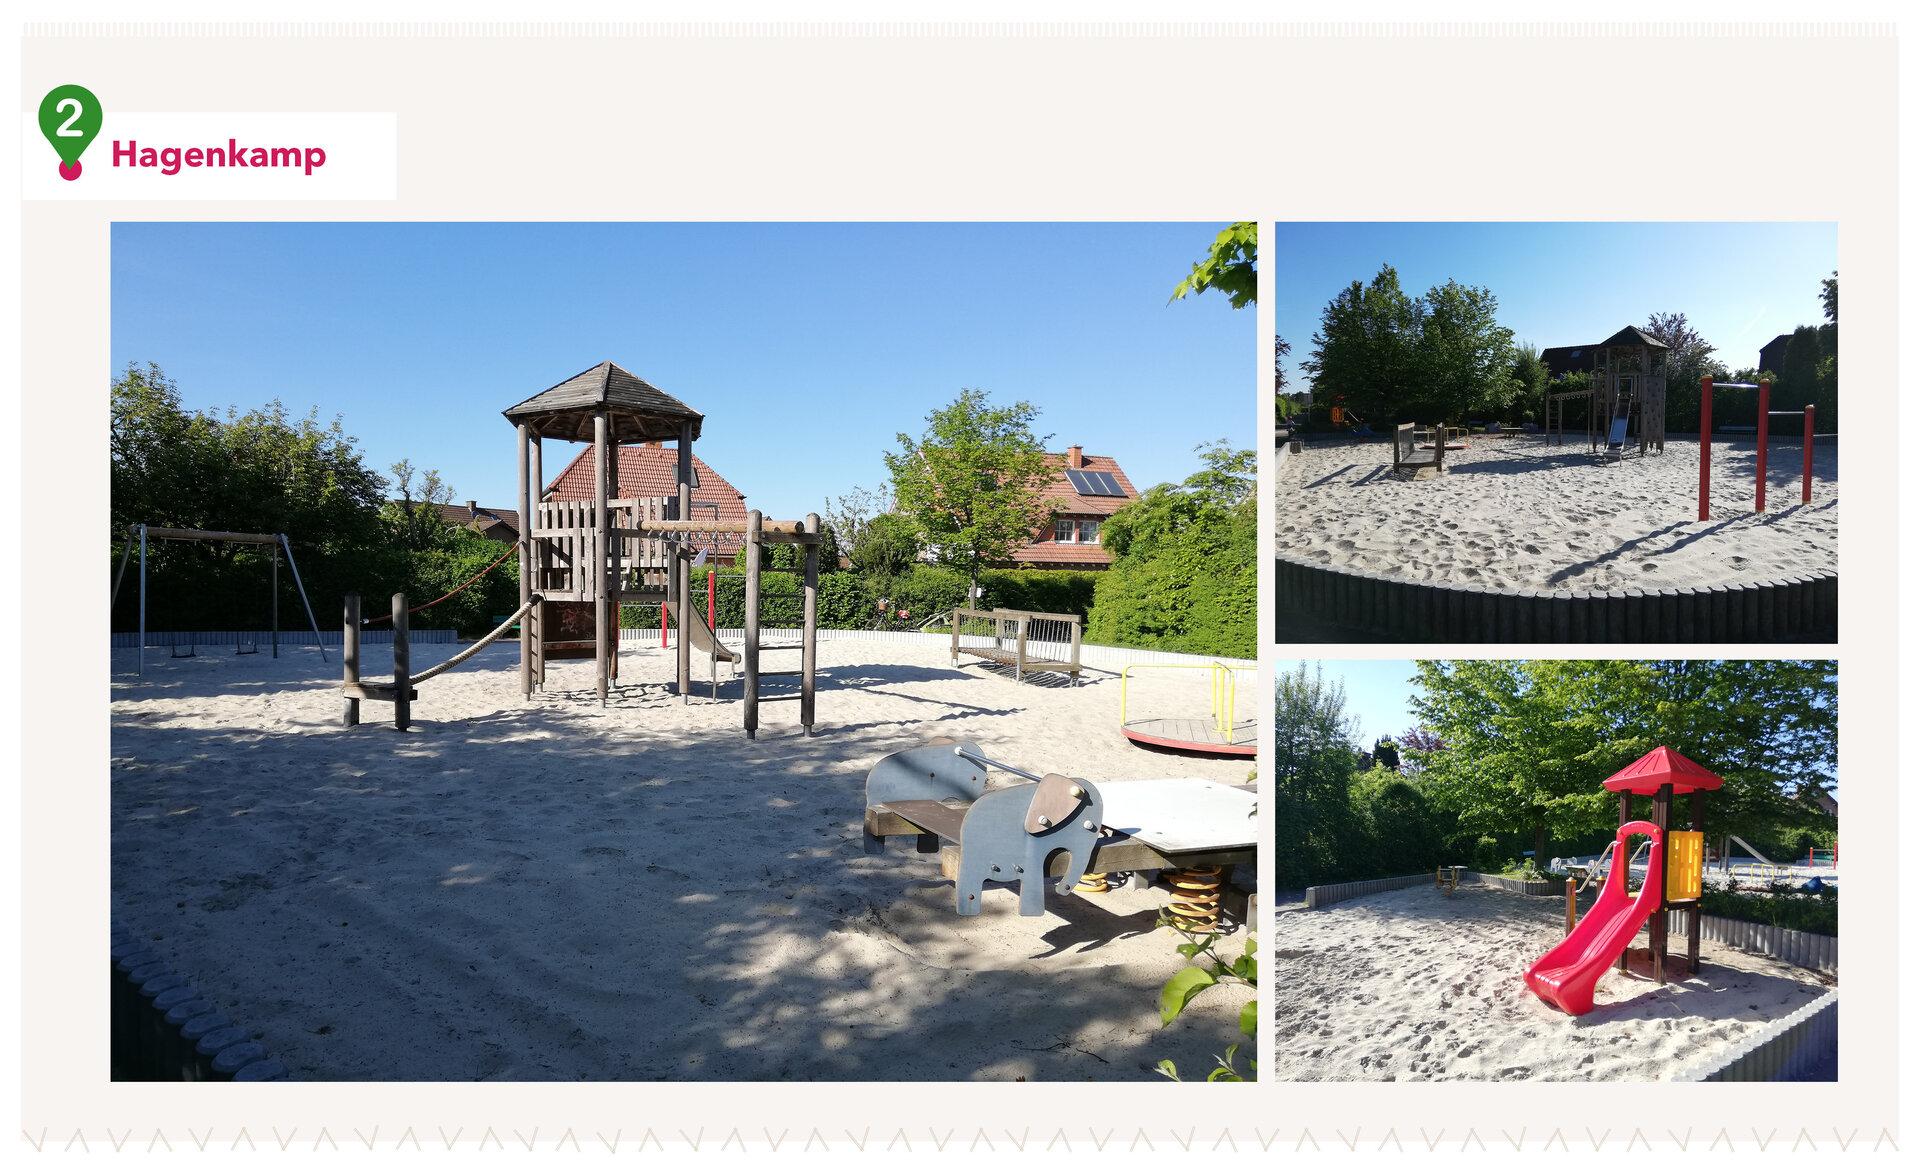 Spielplatz Hagenkamp